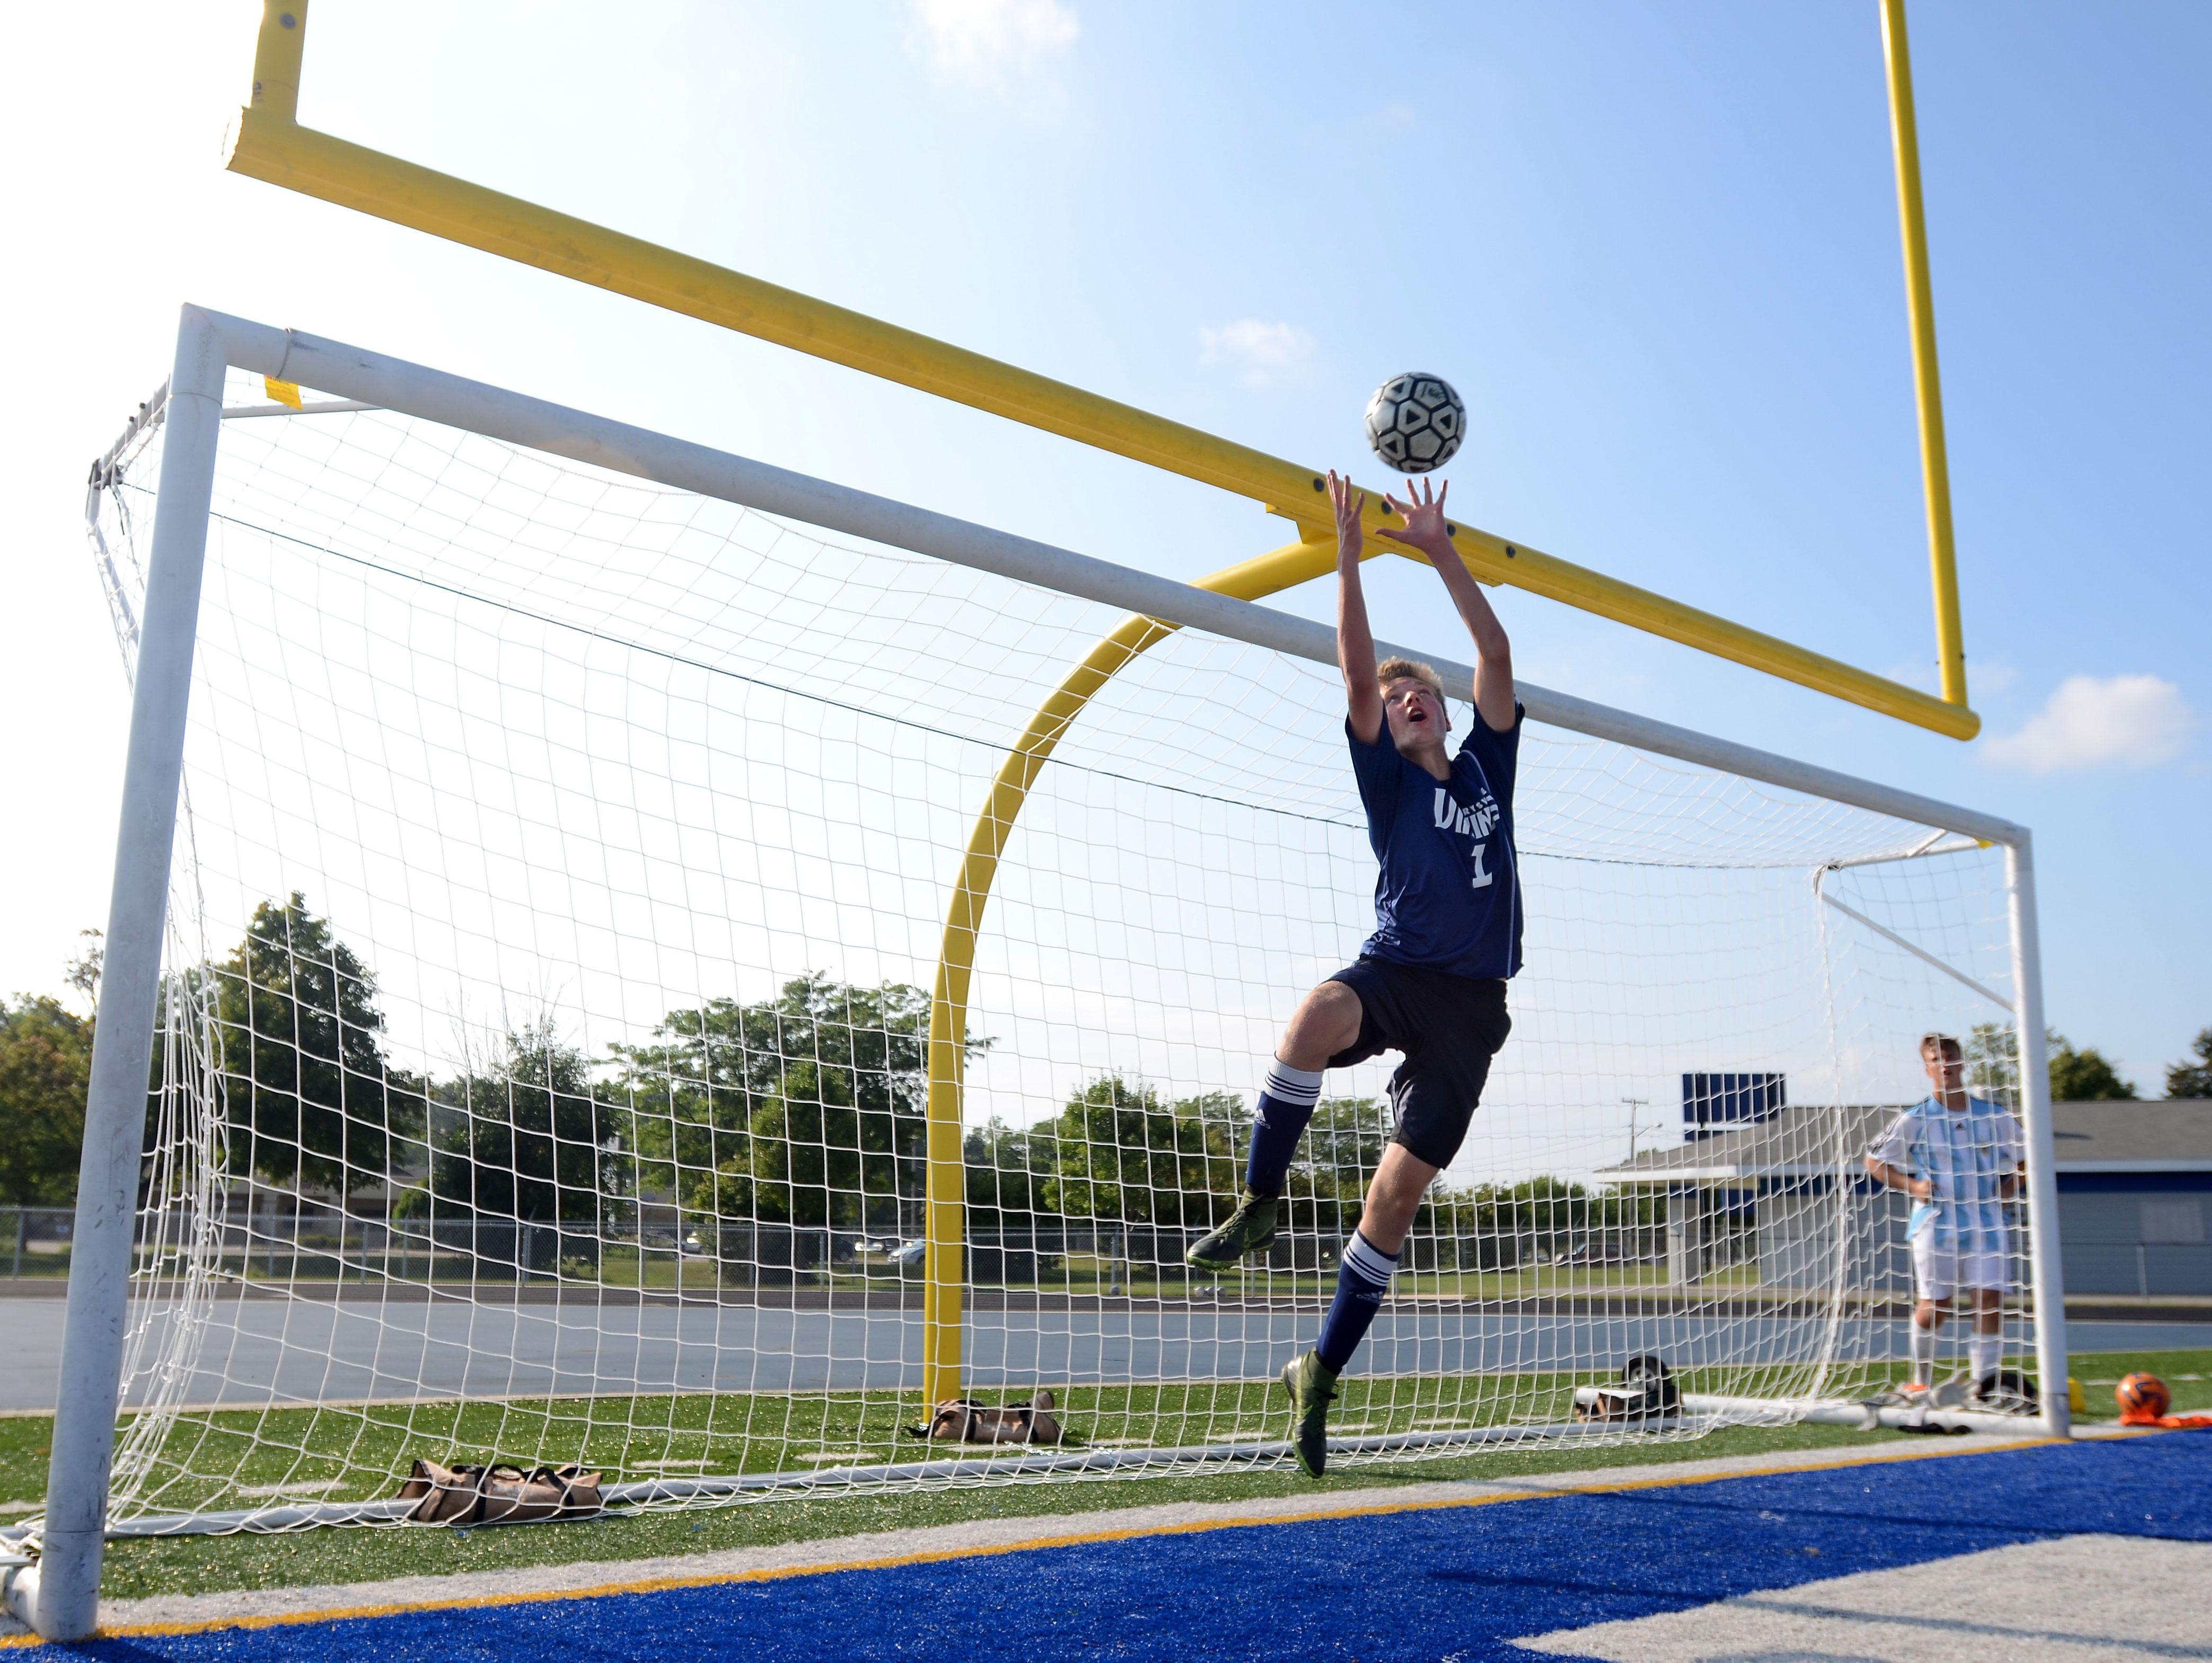 Goalkeeper Brett Robinson leaps to make the save Tuesday, Aug 18, during soccer practice at Walt Braun Stadium at Marysville High School.